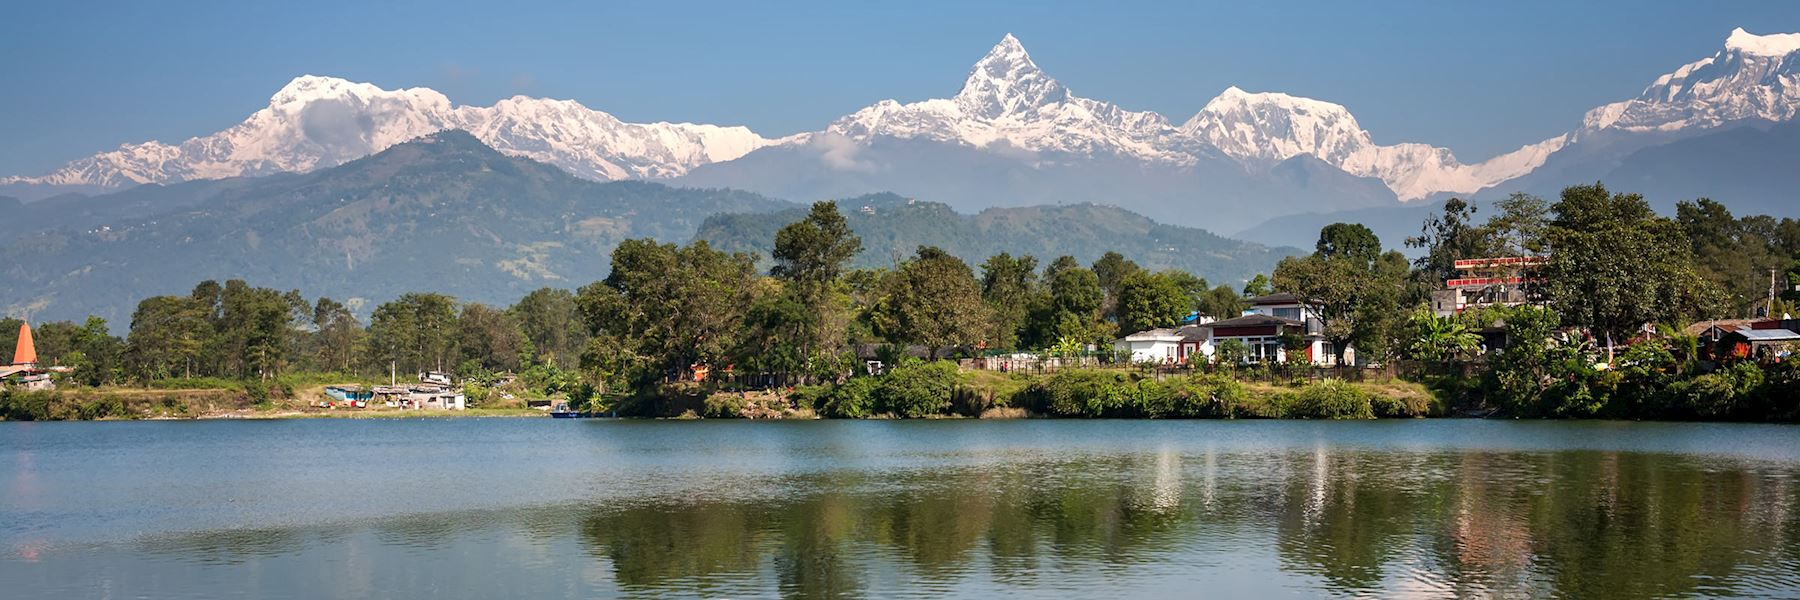 Visit Pokhara, Nepal